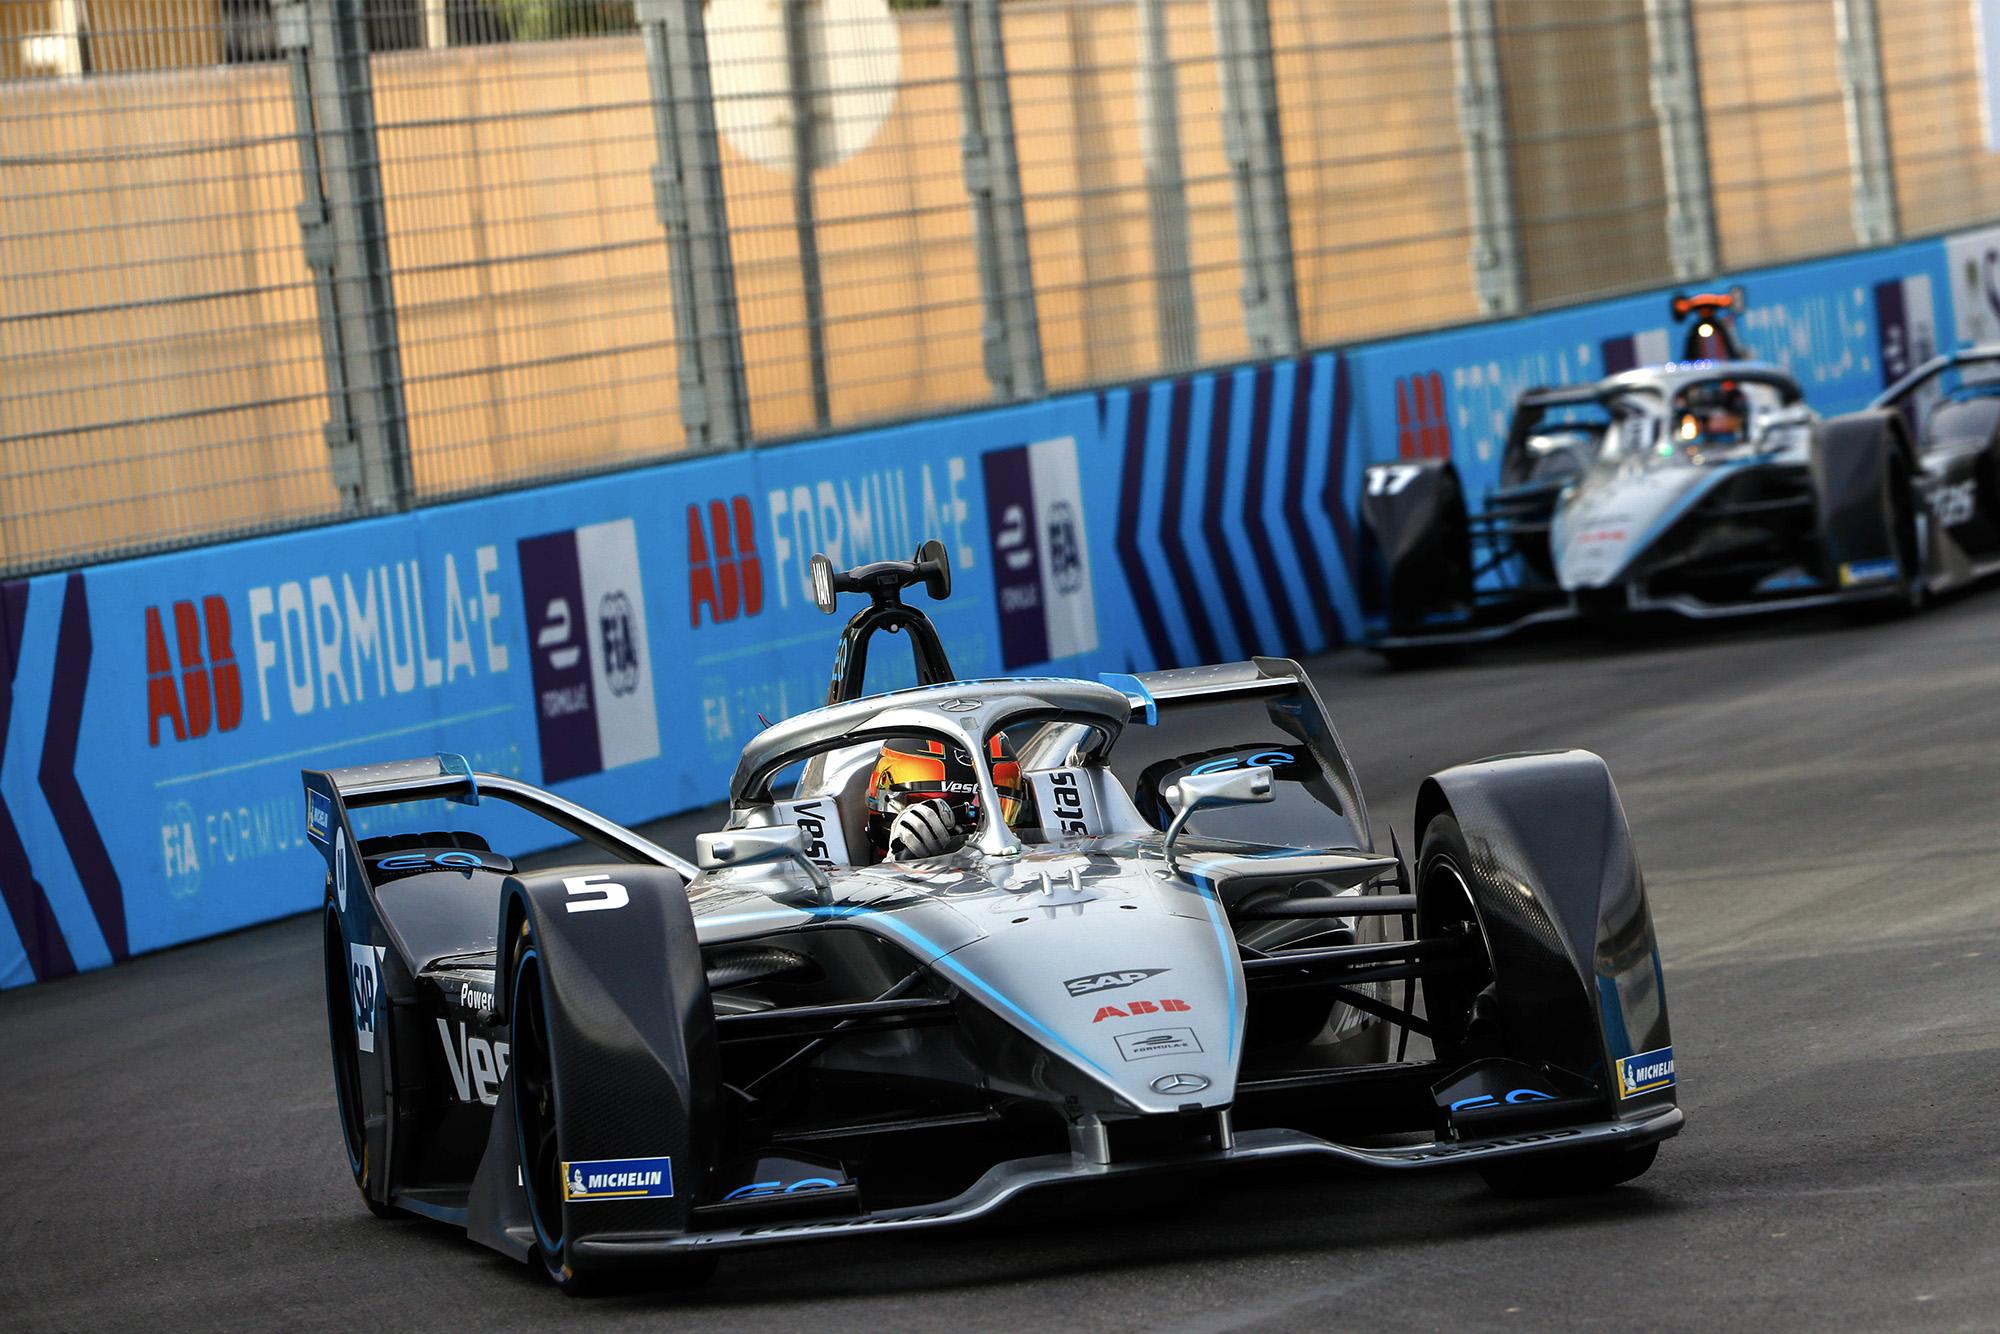 Stoffel Vandoorne and Nyck de Vries during the 2019 Saudi E-Prix